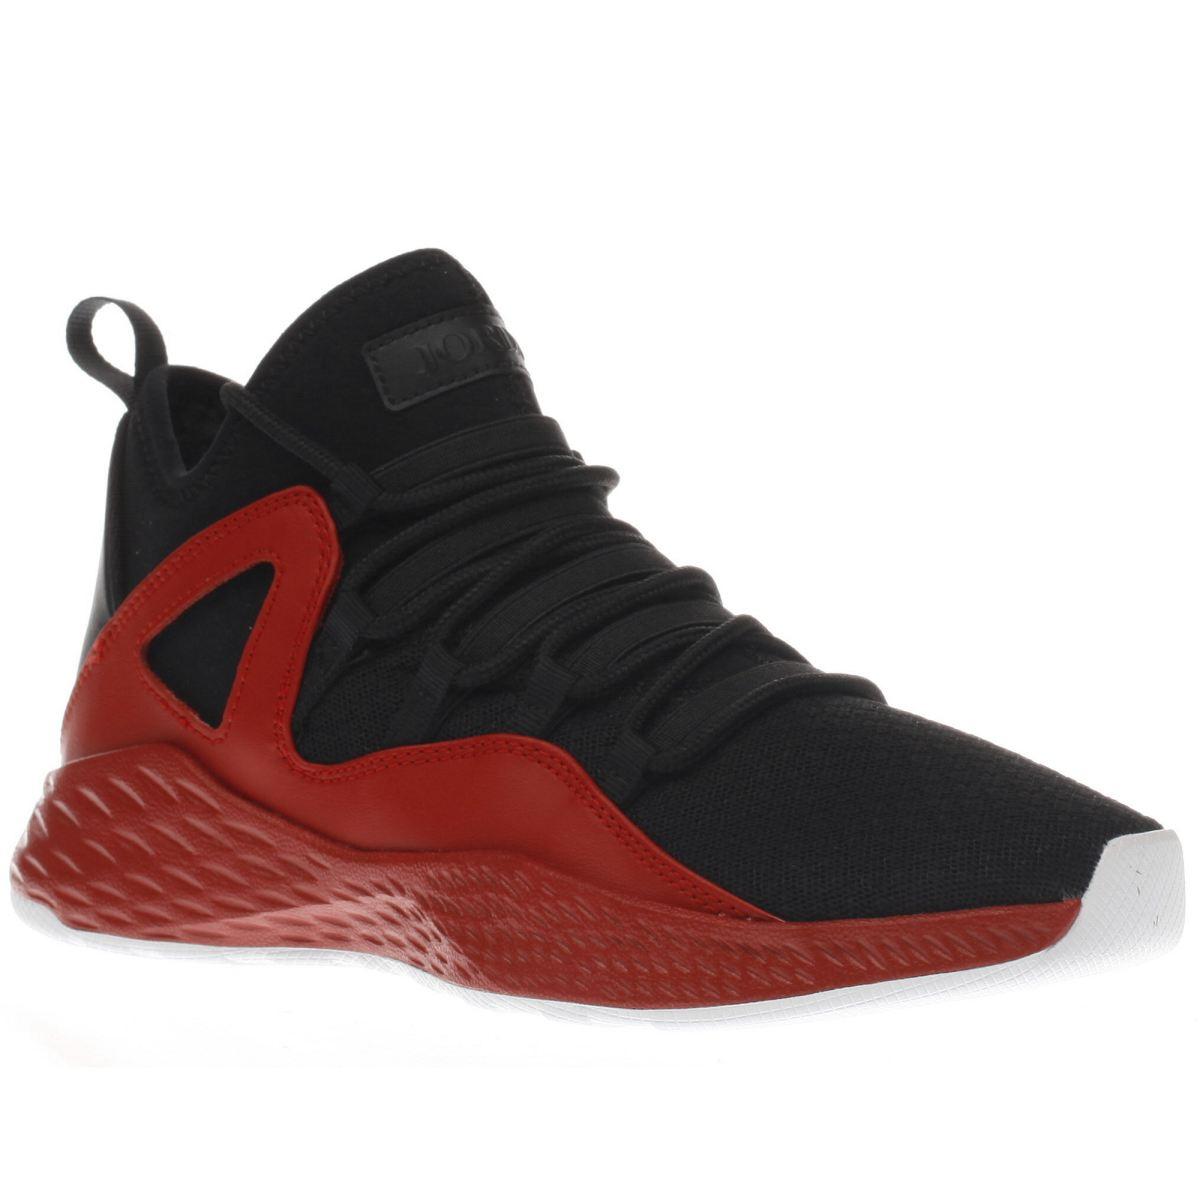 nike jordan Nike Jordan Black & Red Jordan Formula 23 Unisex Youth